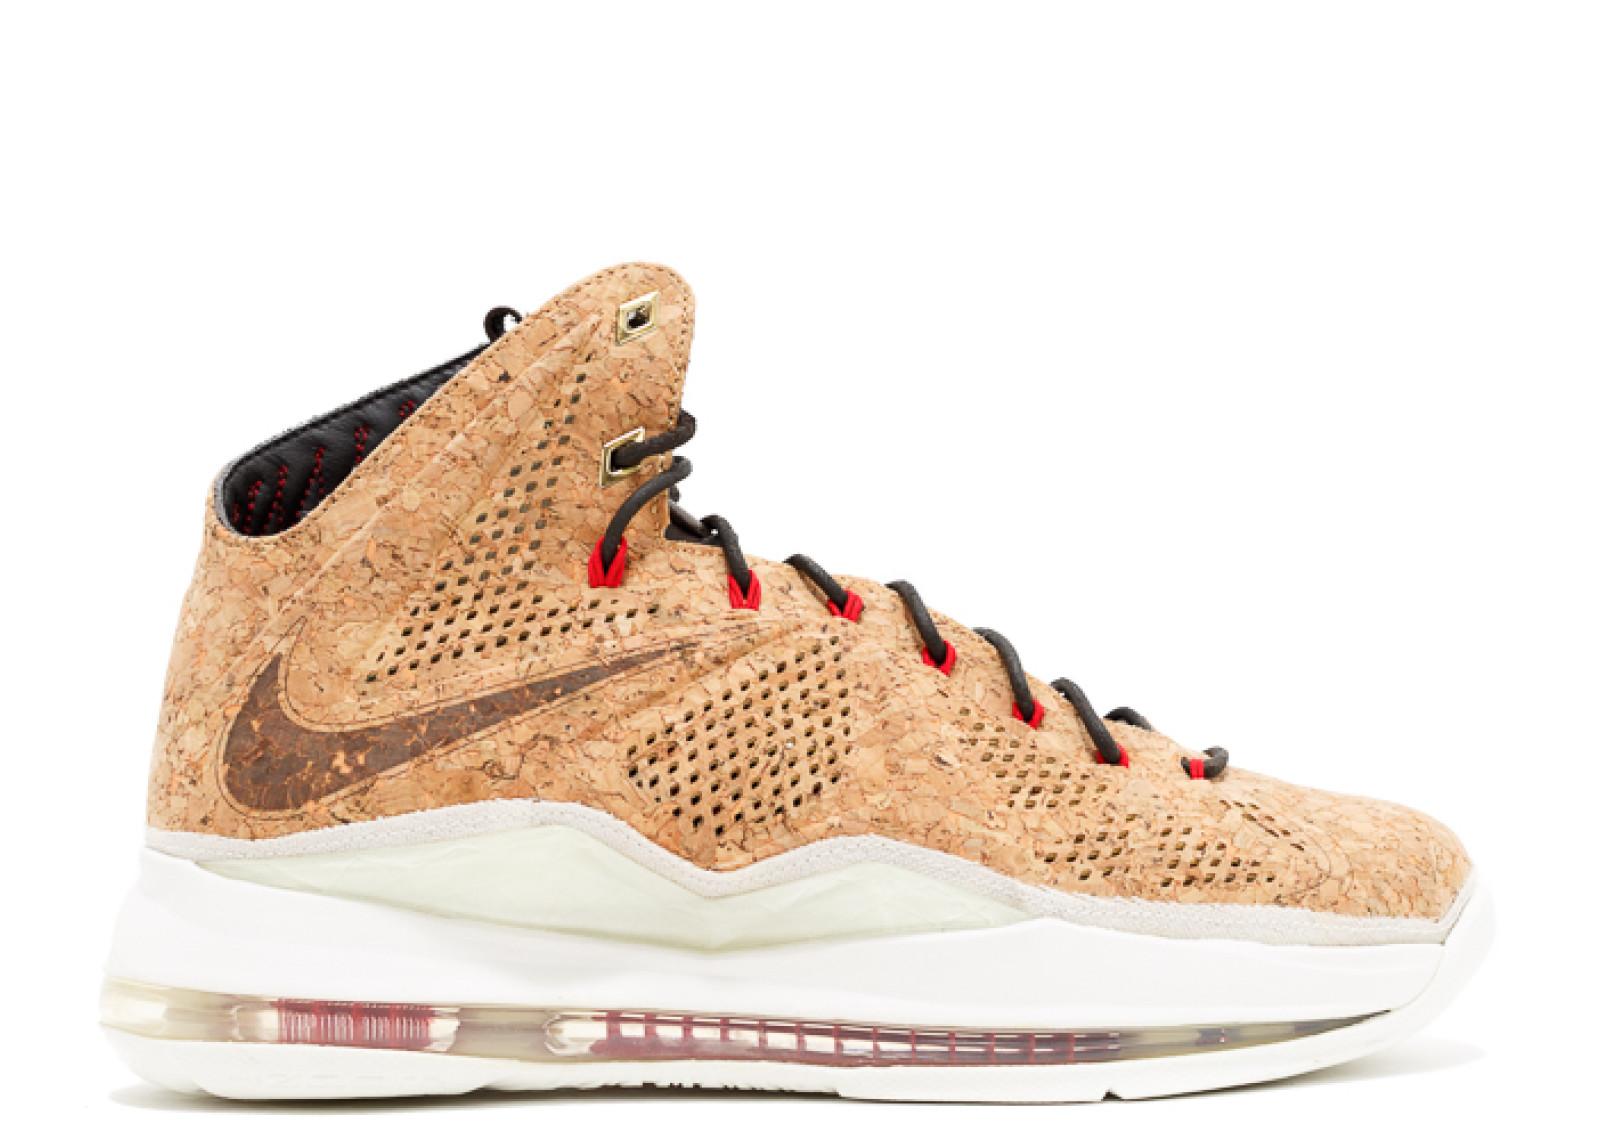 super popular 2798c 445f5 Nike - Men - Nike Lebron X Ext Cork Qs - 580890-200 - Size 10.5